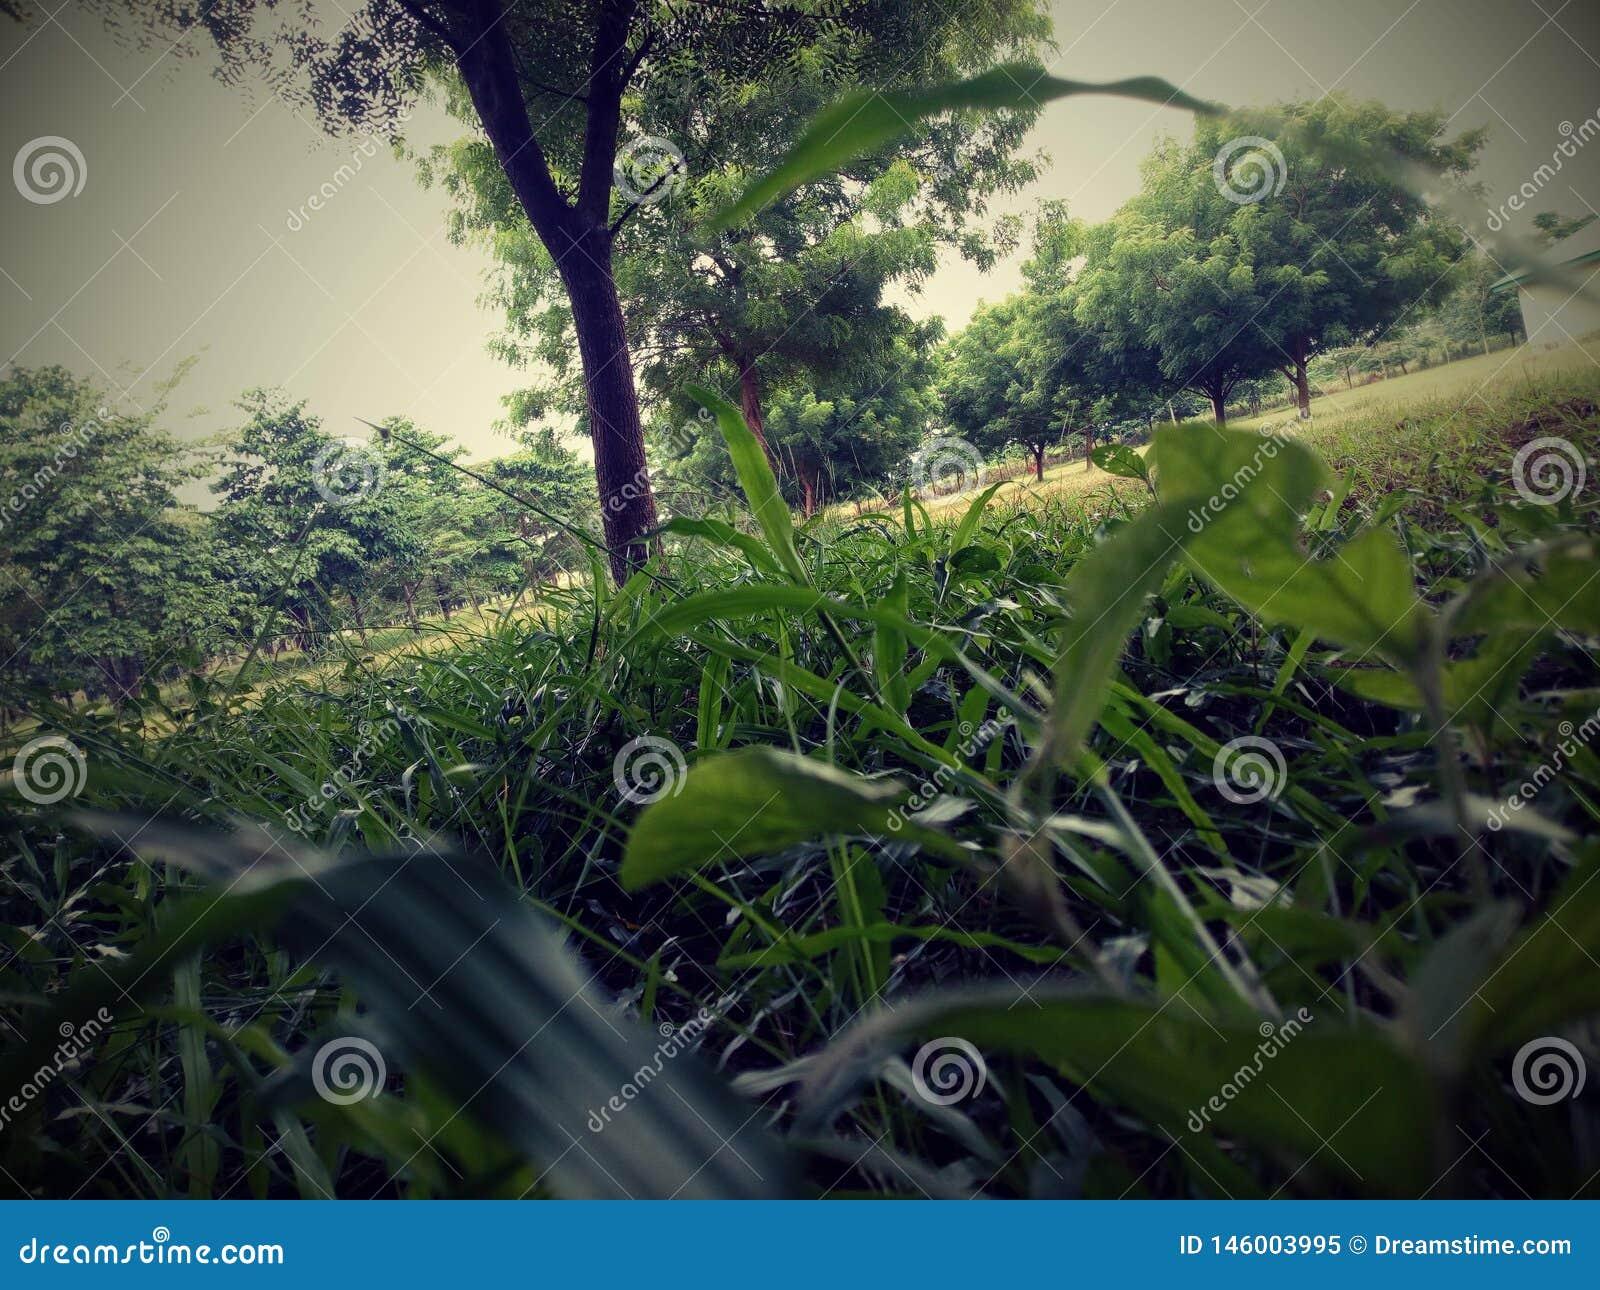 Summer in Nigeria